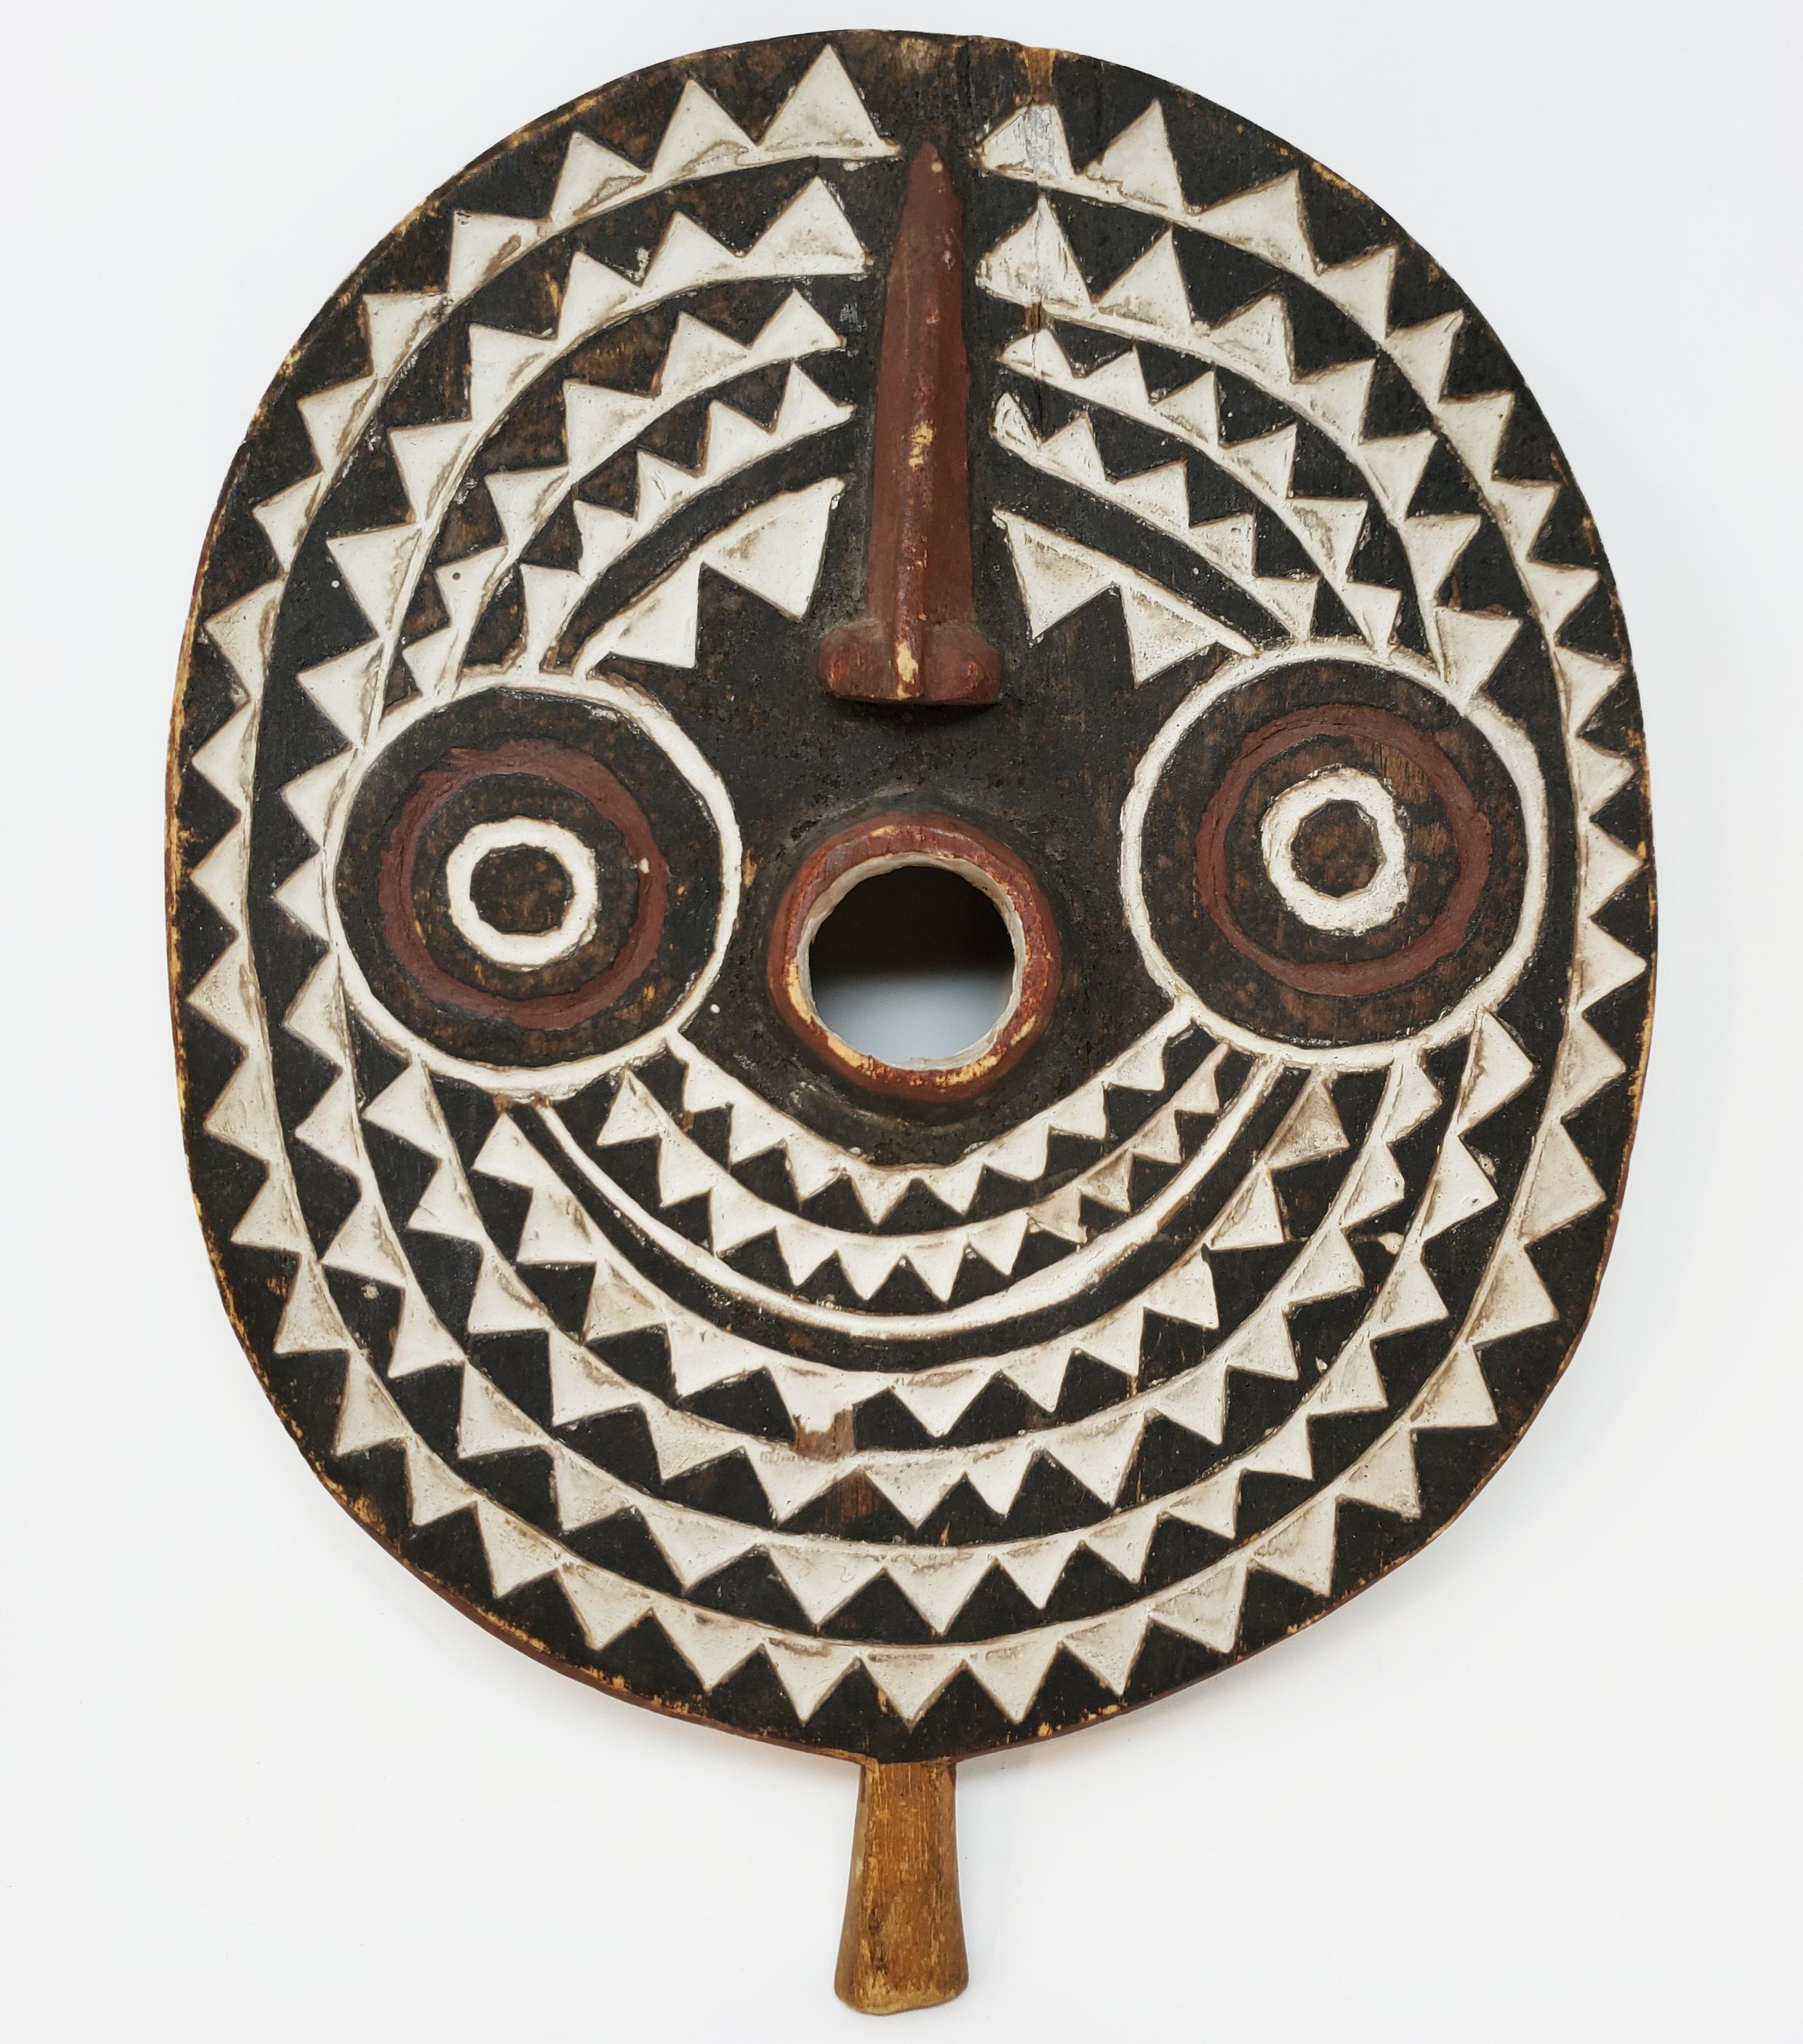 small-sun-mask-lg.jpg